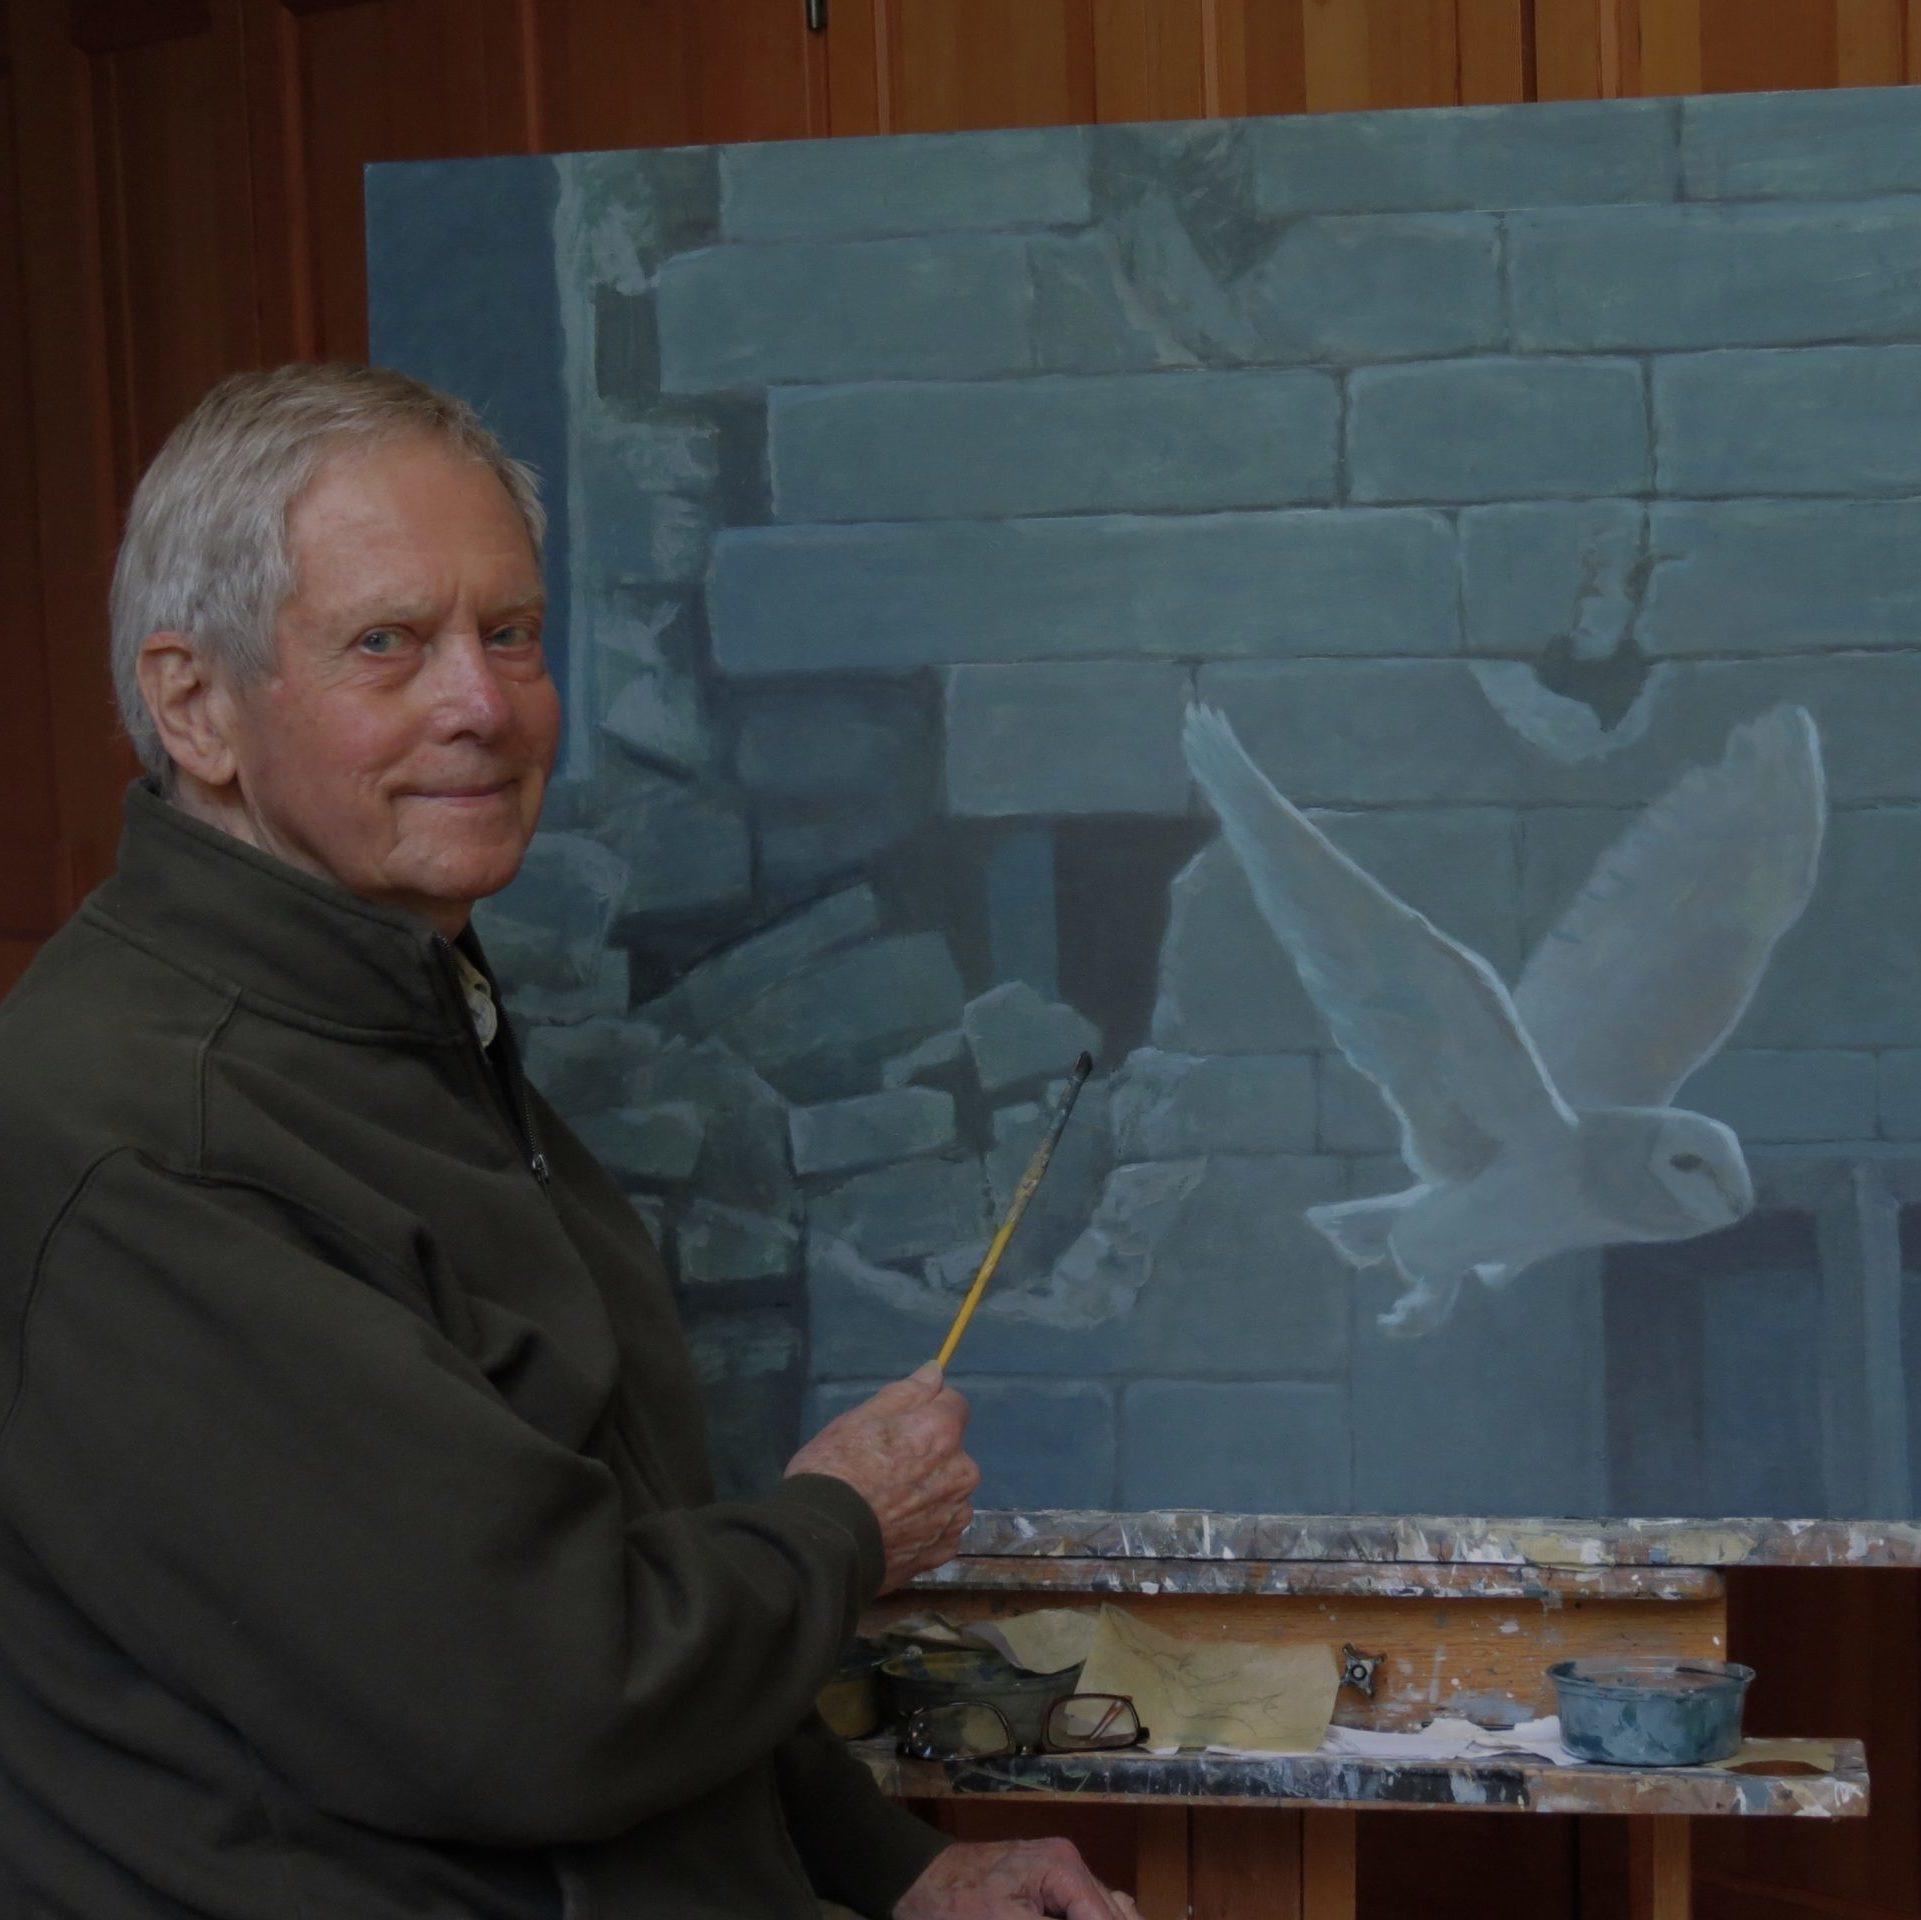 Robert Bateman, Barn Owl at Biddulph Old Hall